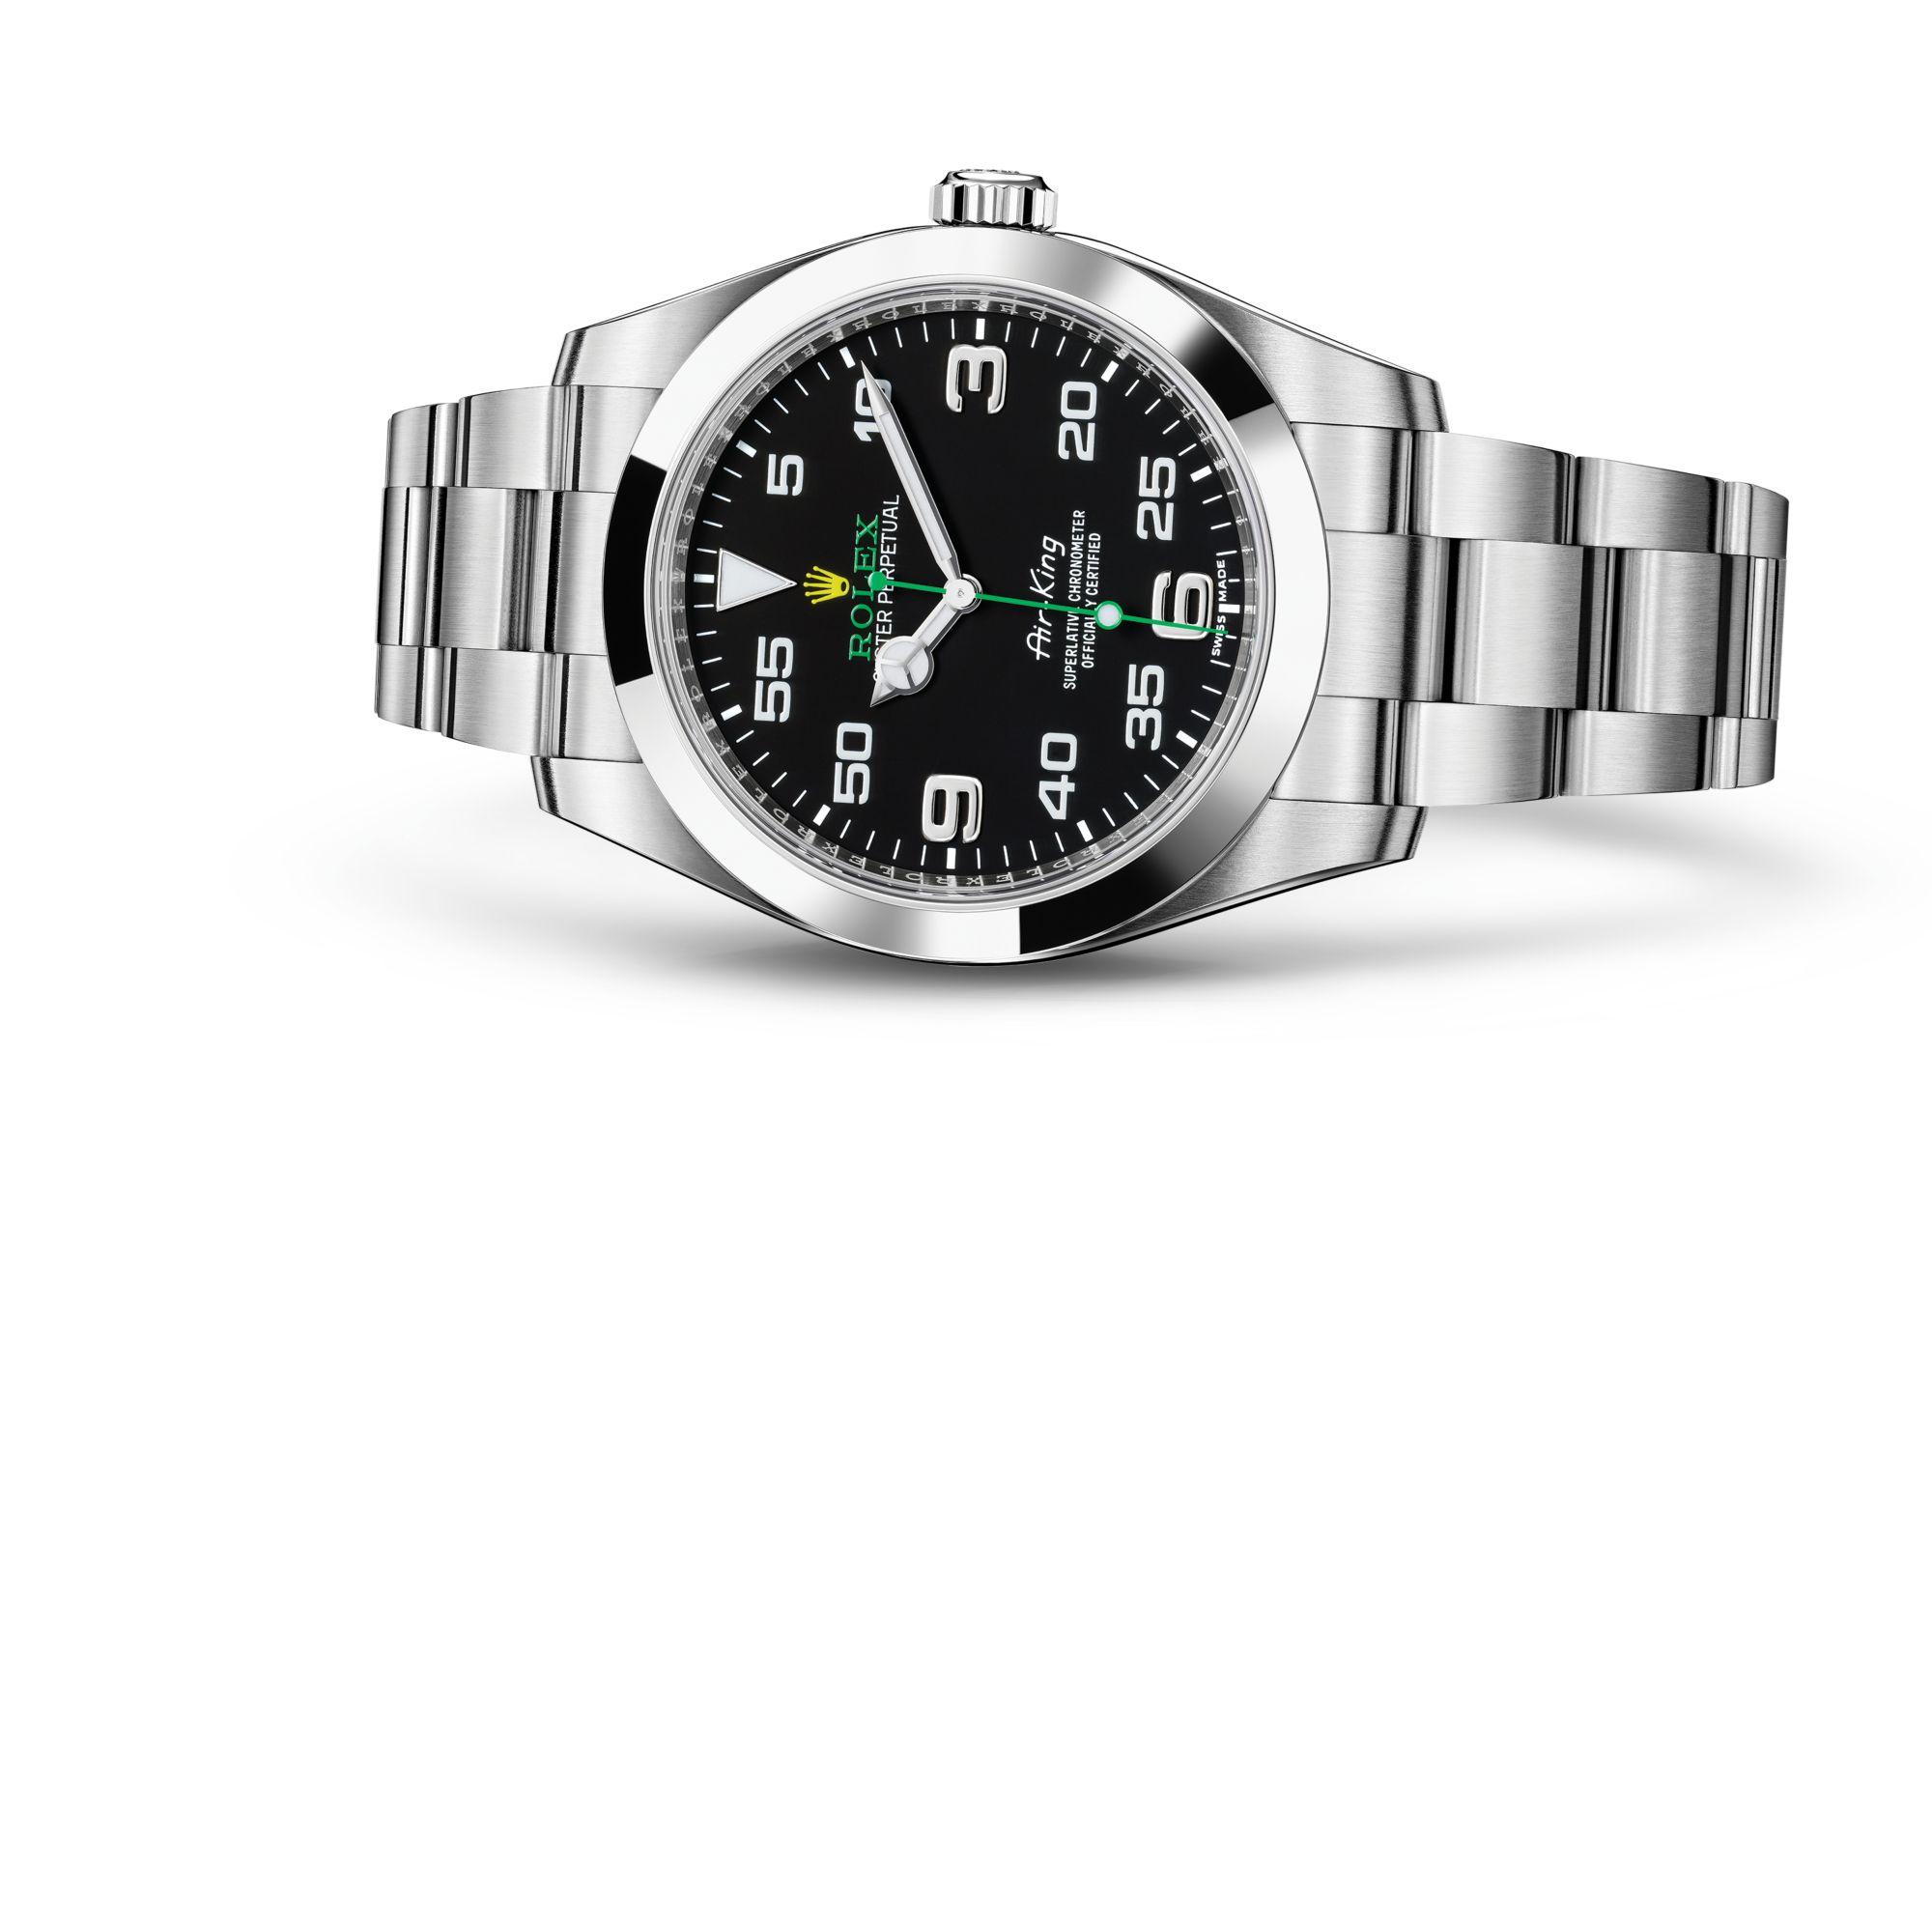 "Rolex <span lang=""en"">Air-King</span> M116900-0001"